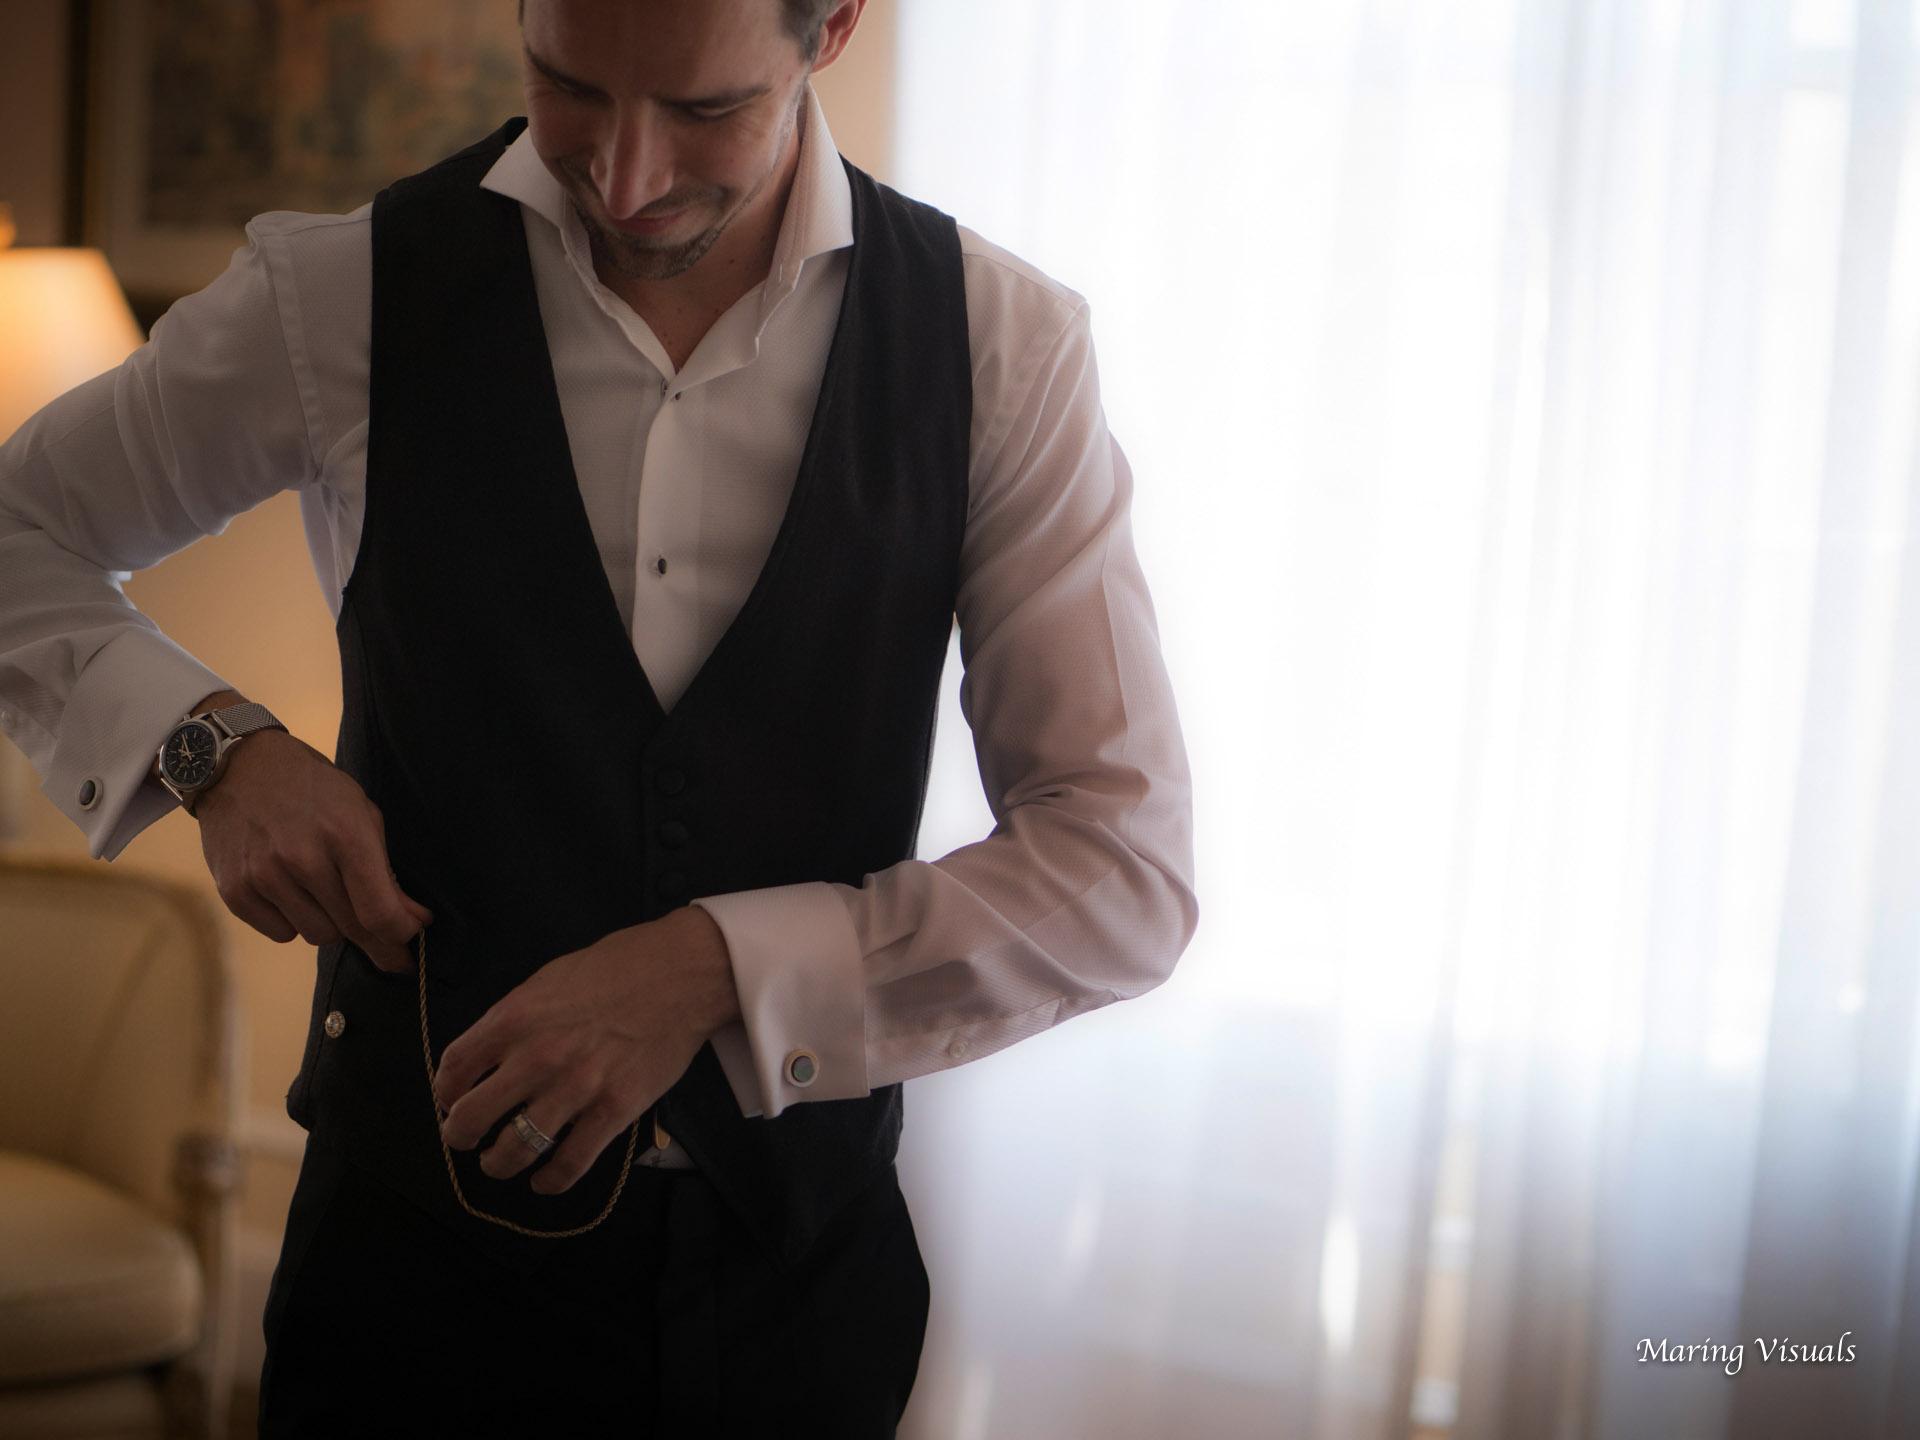 David Tutera Weddings by Maring Visuals 00486.jpg